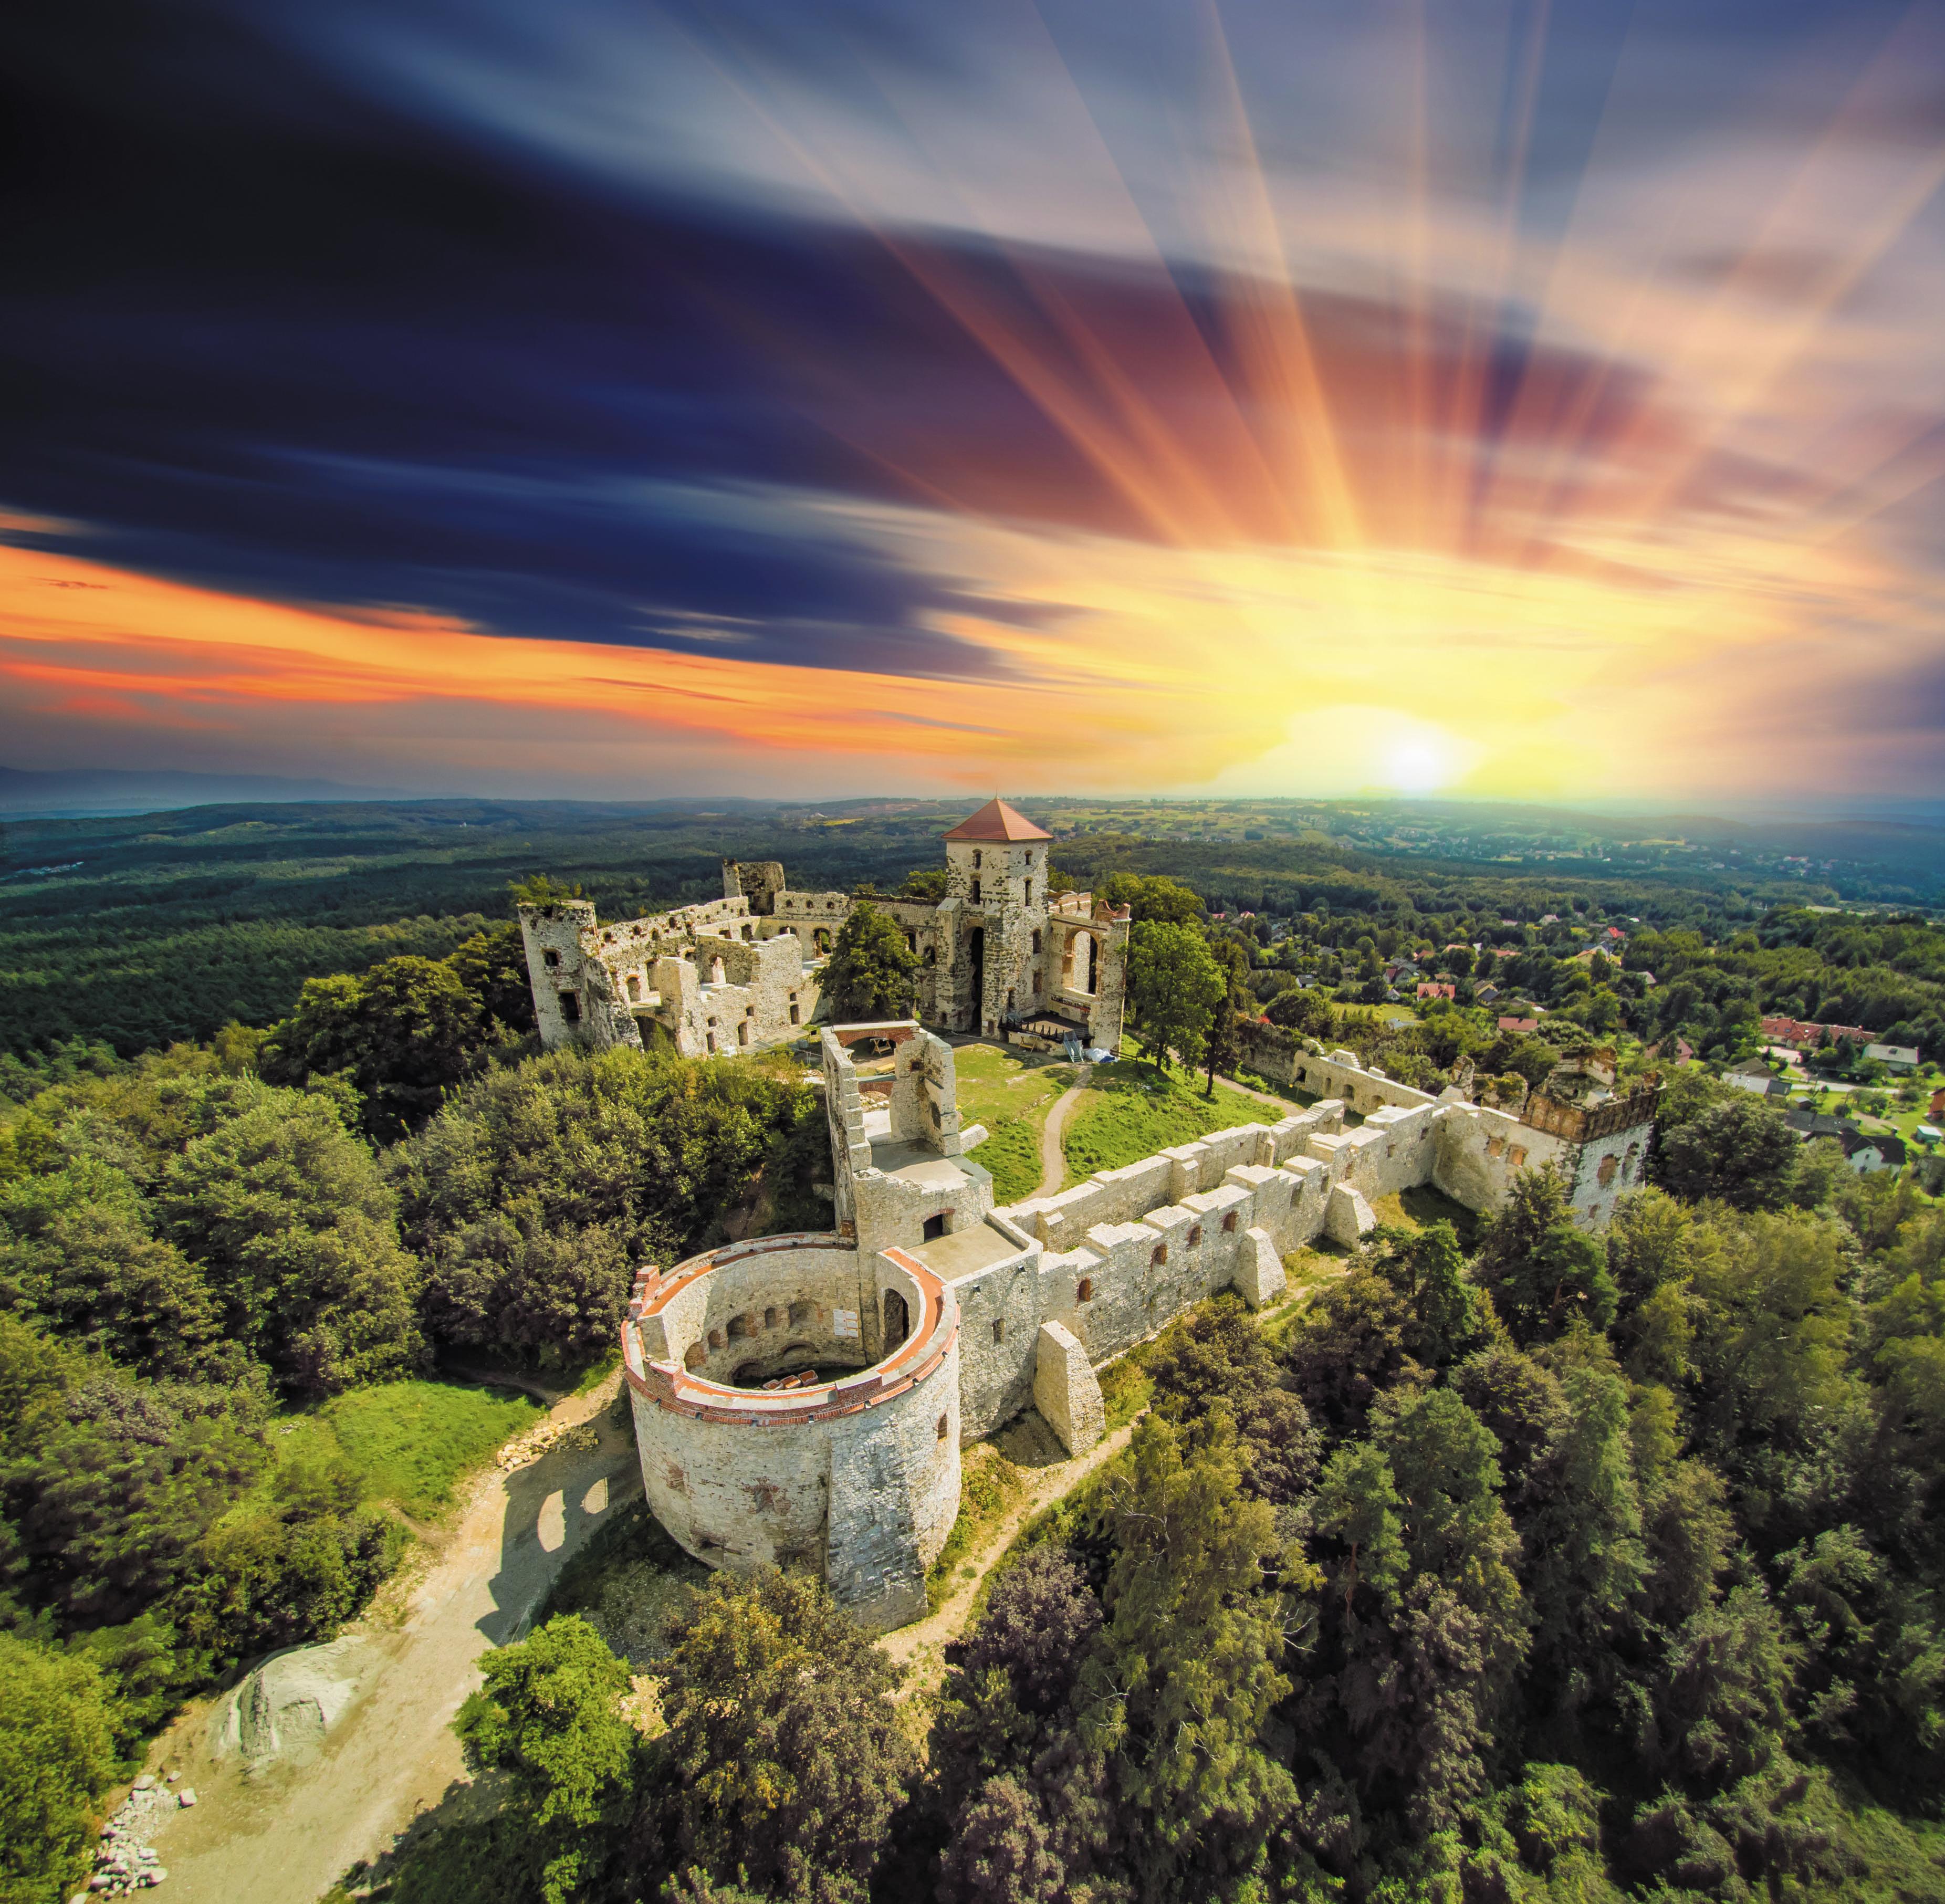 Zamek Tenczyn fot. M. Sowiński (1)